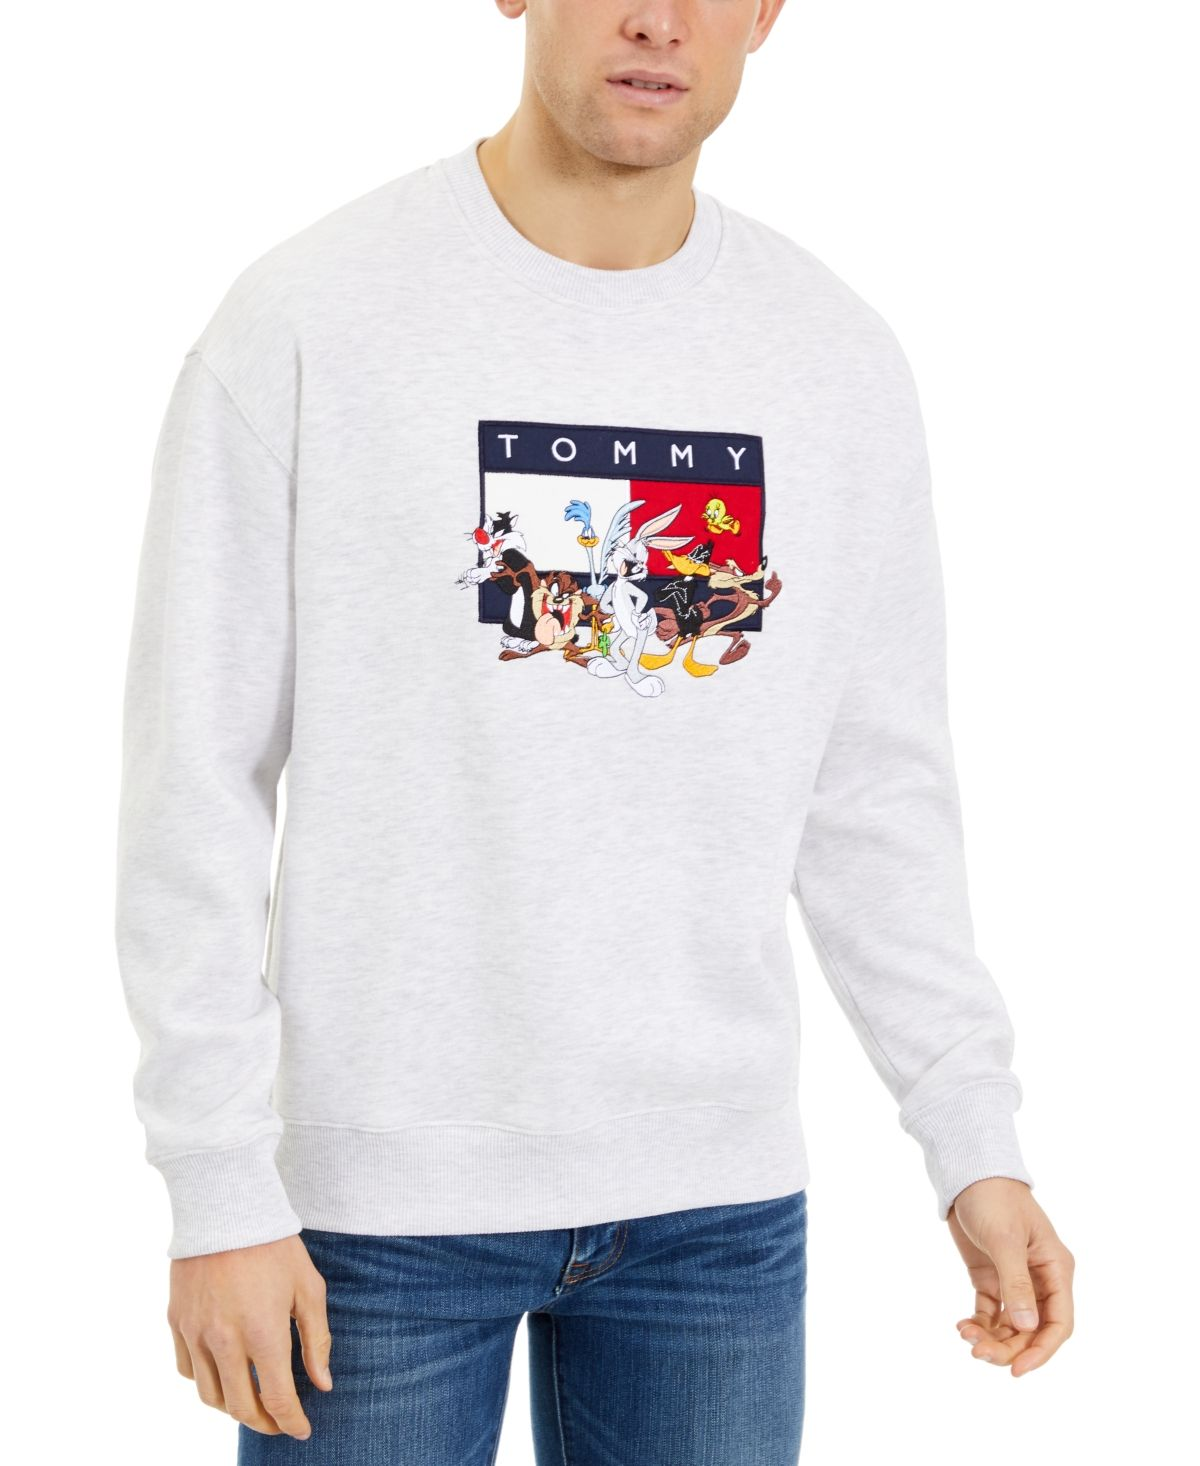 Tommy Hilfiger Men S Looney Tunes Character Sweatshirt Pale Grey Heather Tommy Hilfiger Sweatshirt Tommy Tommy Hilfiger [ 1466 x 1200 Pixel ]